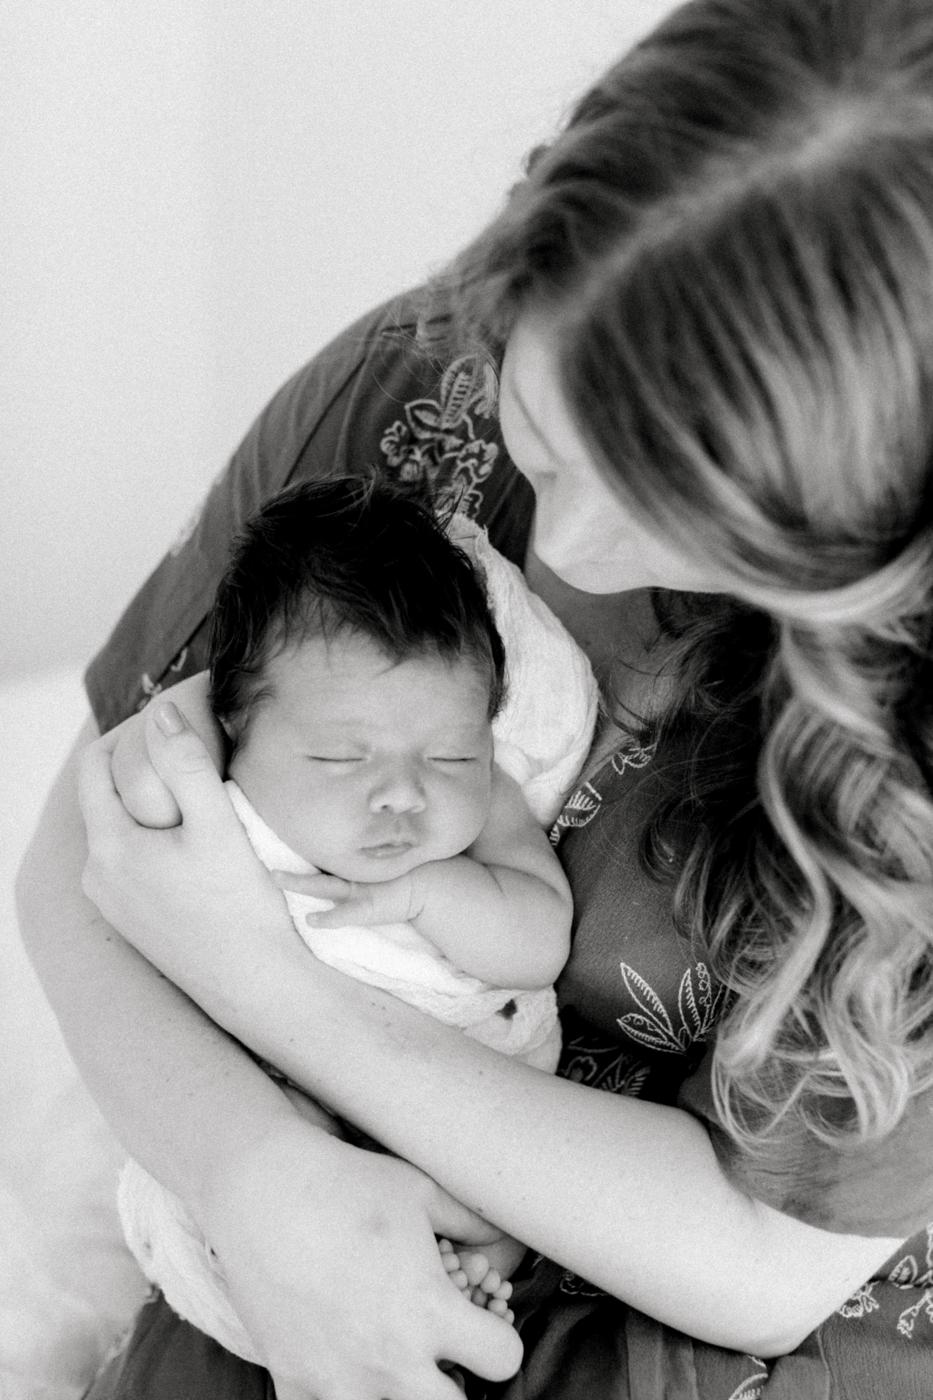 four corners photography atlanta maternity photographer atlanta newborn photographer best atlanta newborn photographer newborn session in home lifestyle newborn session-38.jpg